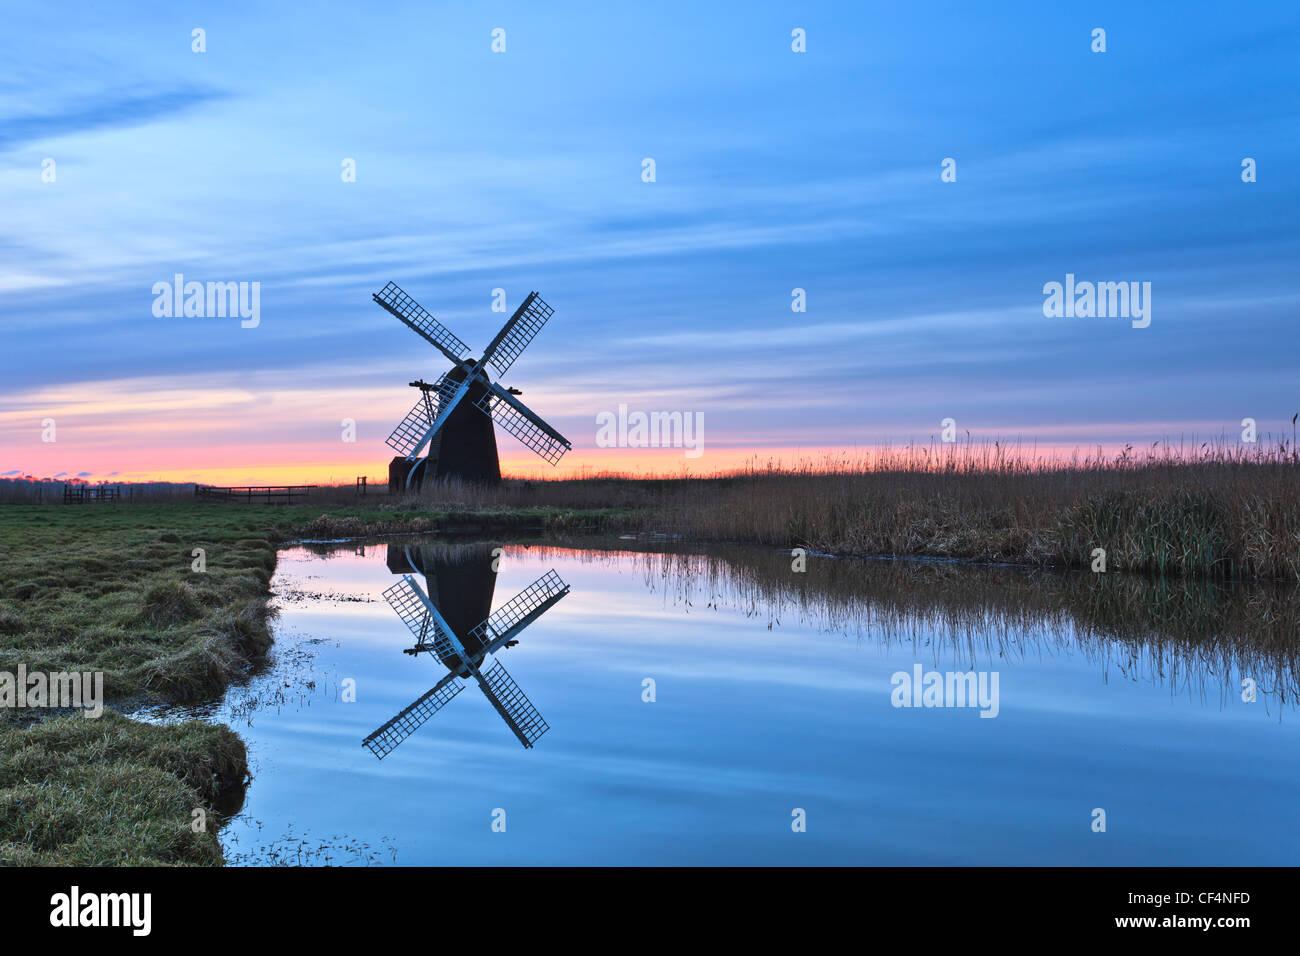 Herringfleet smock mill reflected in still water on a misty winter morning. - Stock Image